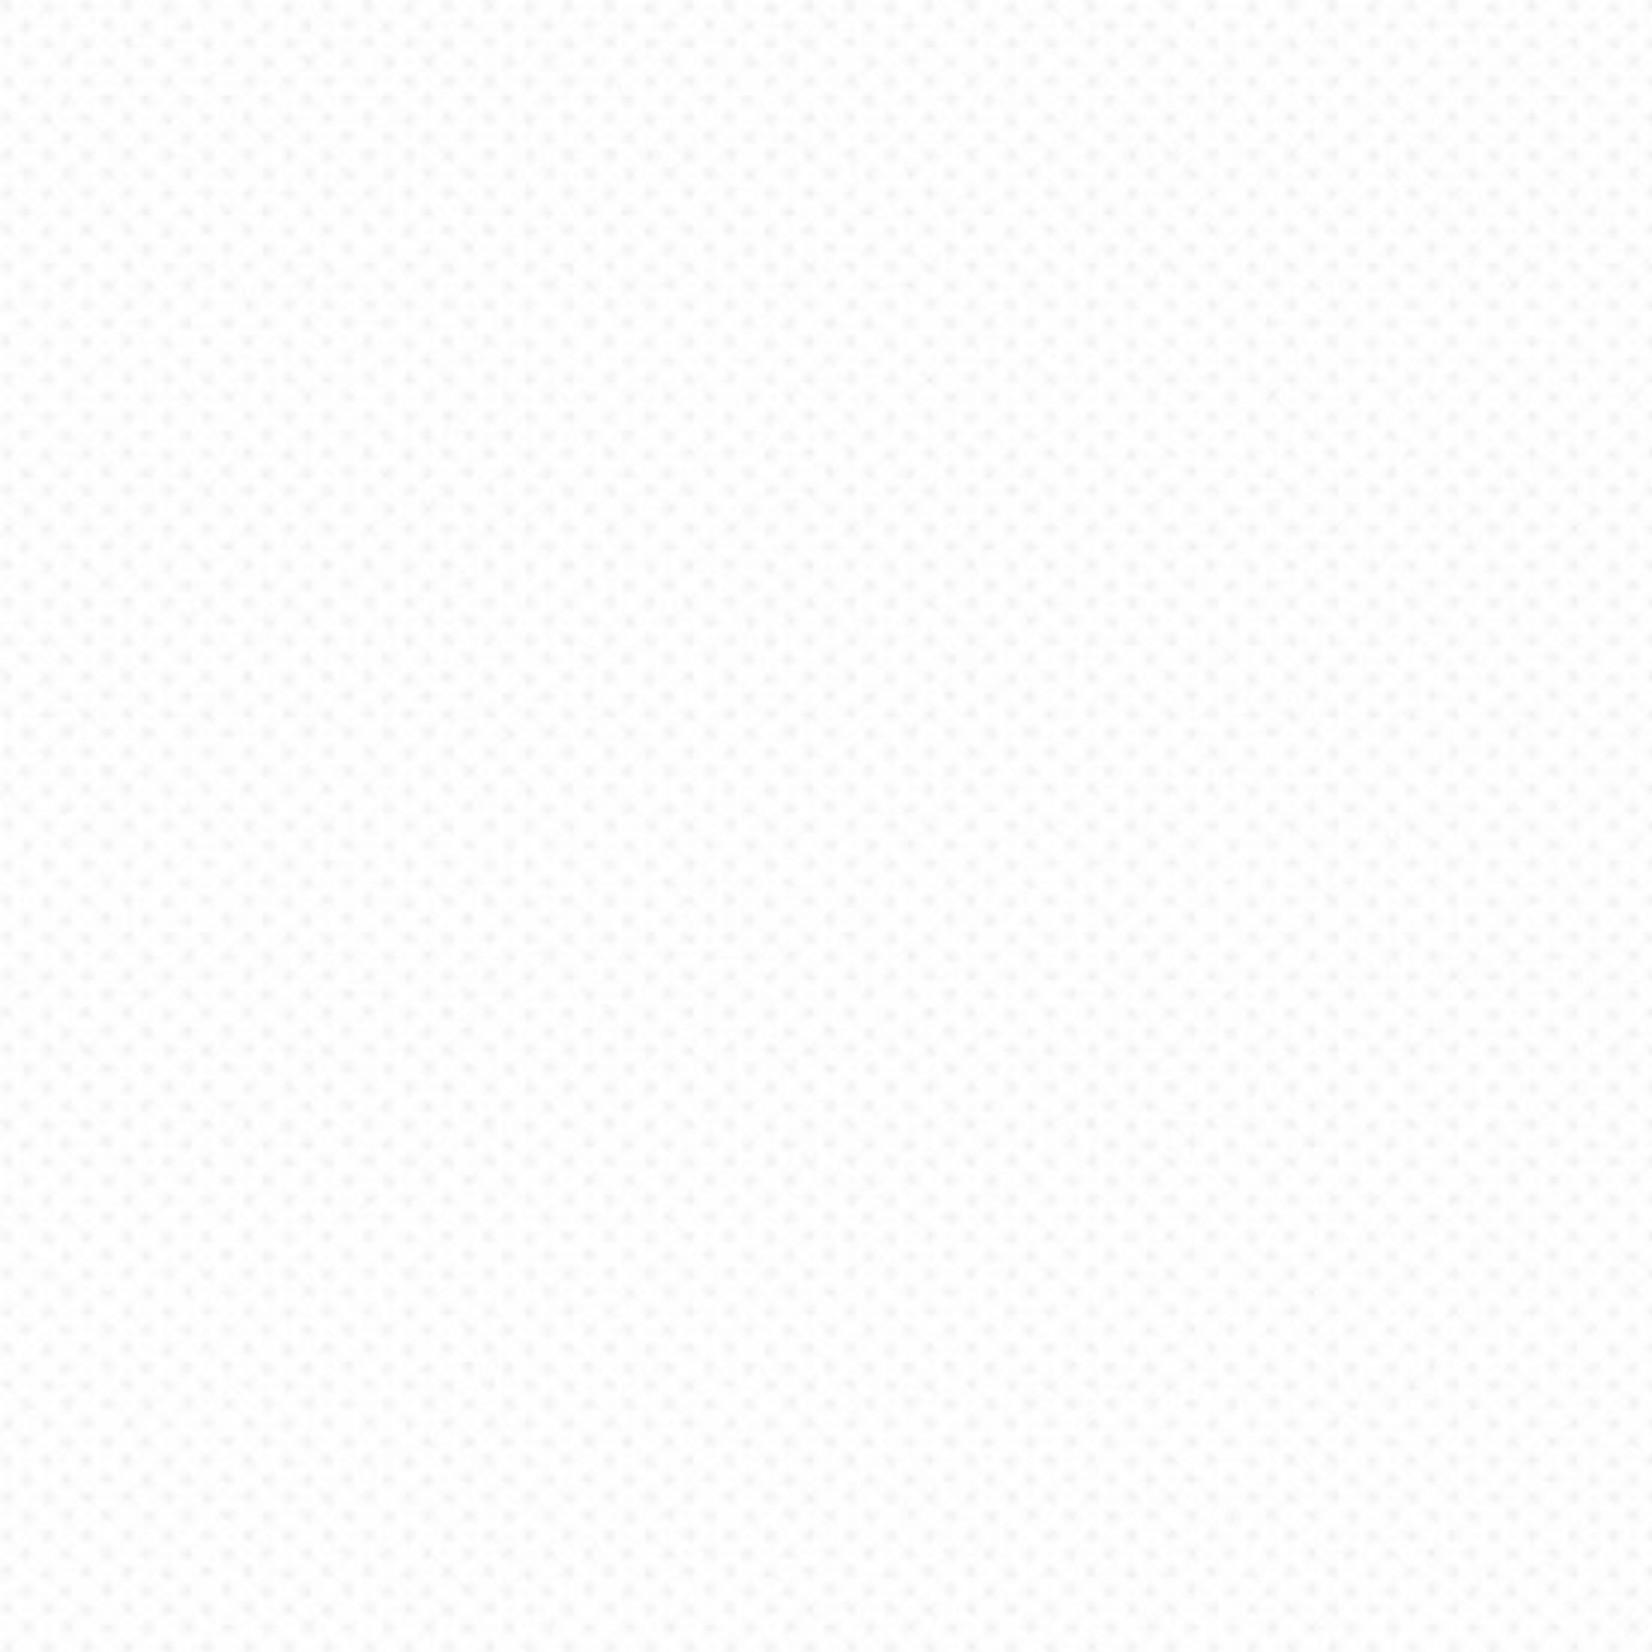 Andover Century Whites, Small Asterisks CS-9679-WW $0.18 per cm or $18/m